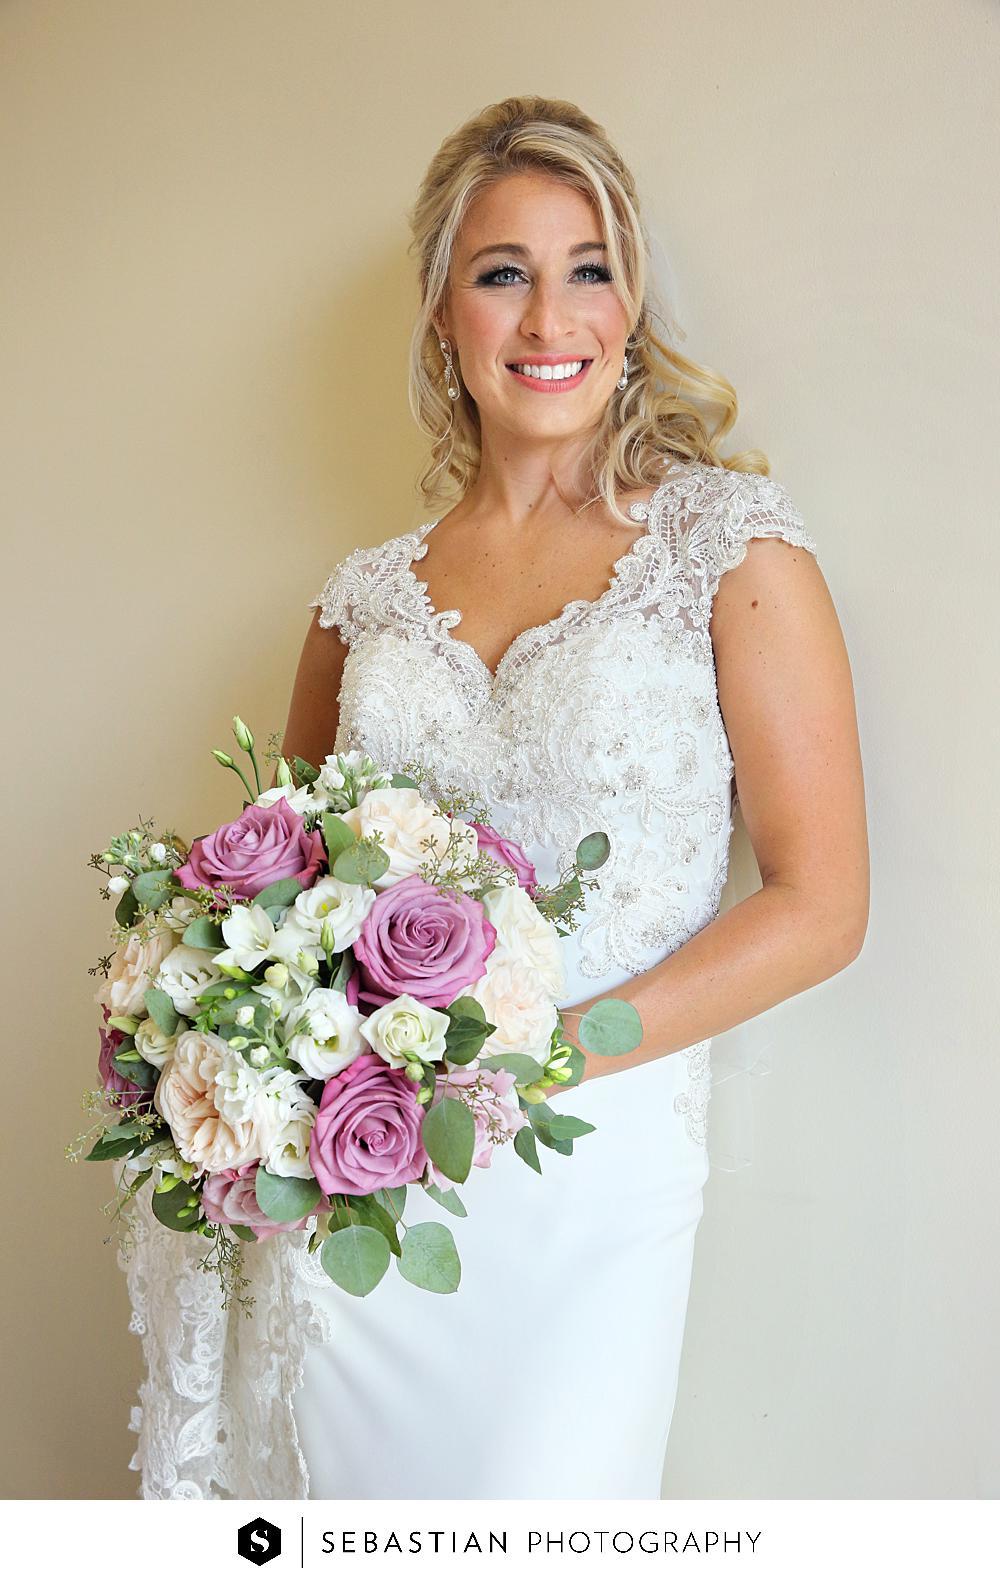 Sebastian Photography_Saint Clements Castle Wedding_CT Wedding Photographer__7017.jpg